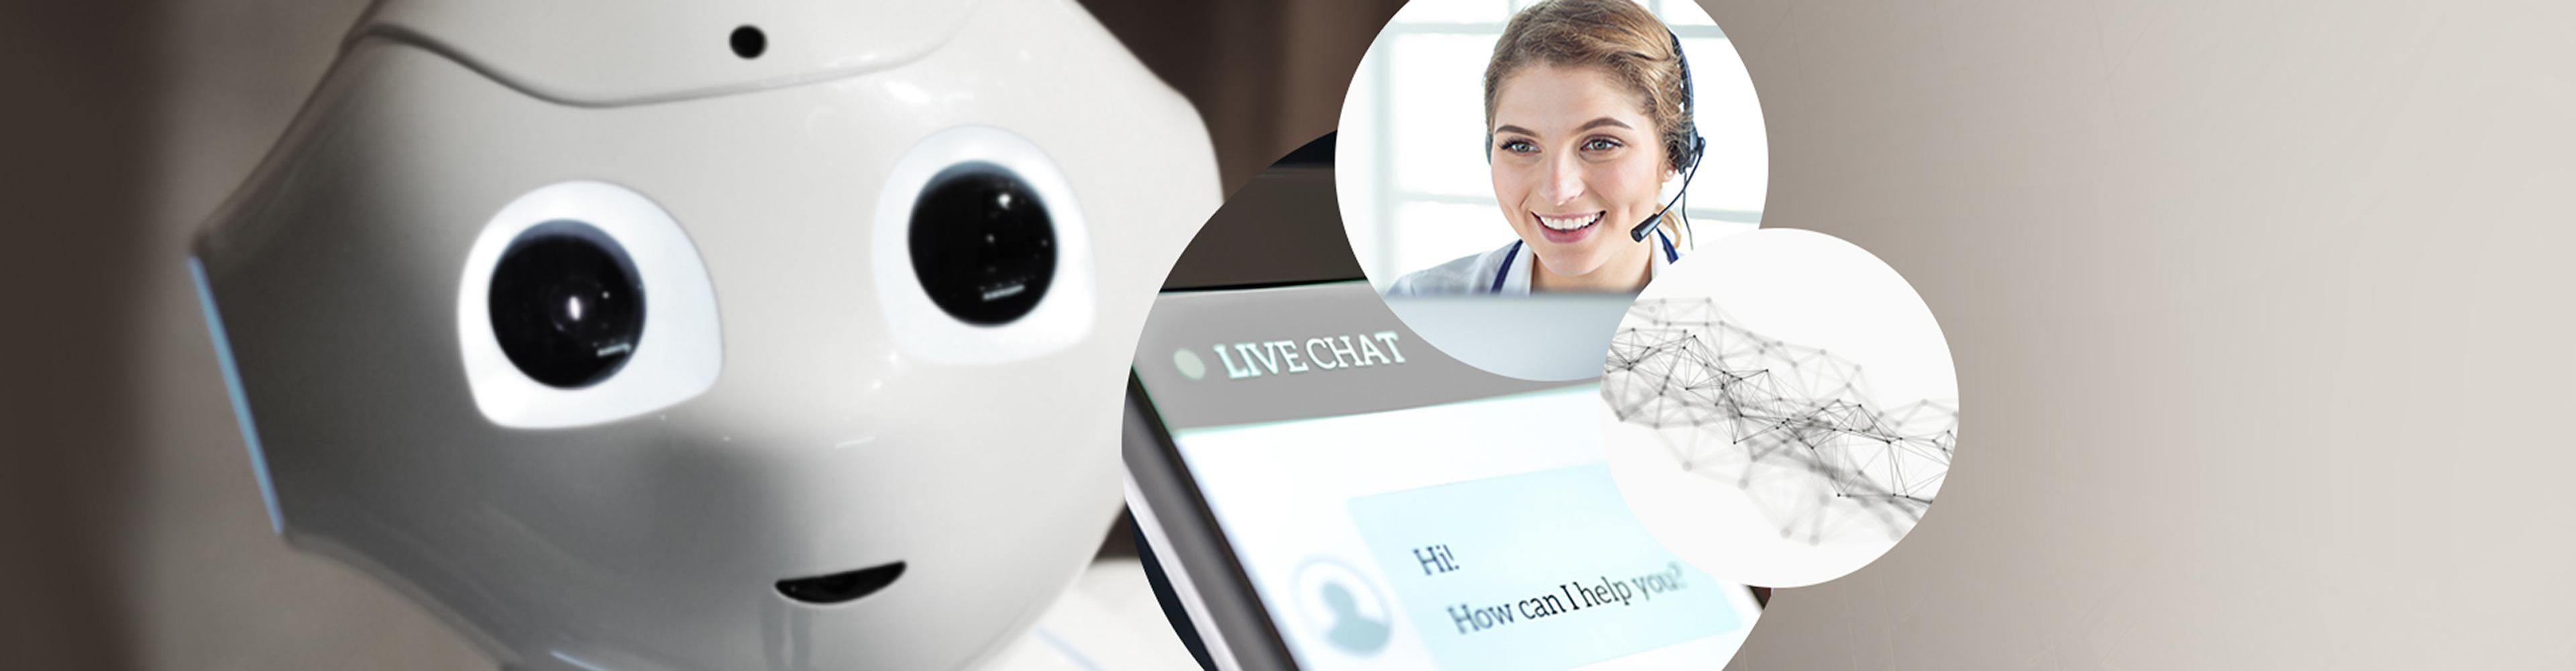 Herobanner-Chatbots-Conversational-AI-3840x1000